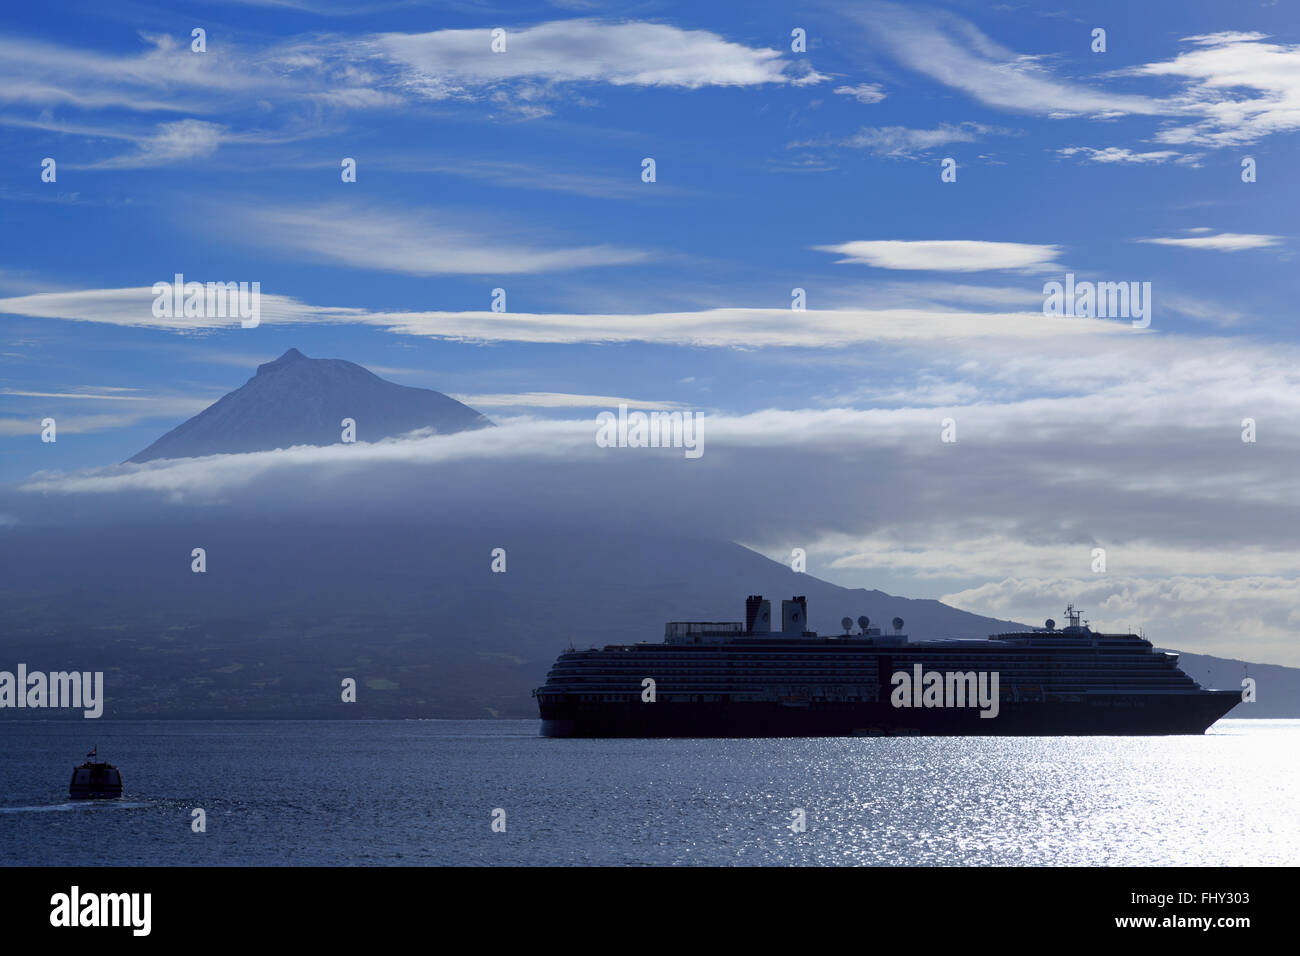 Pico Island Volcanoe & cruise ship, Horta, Faial Island, Azores, Portugal, Europe Stock Photo